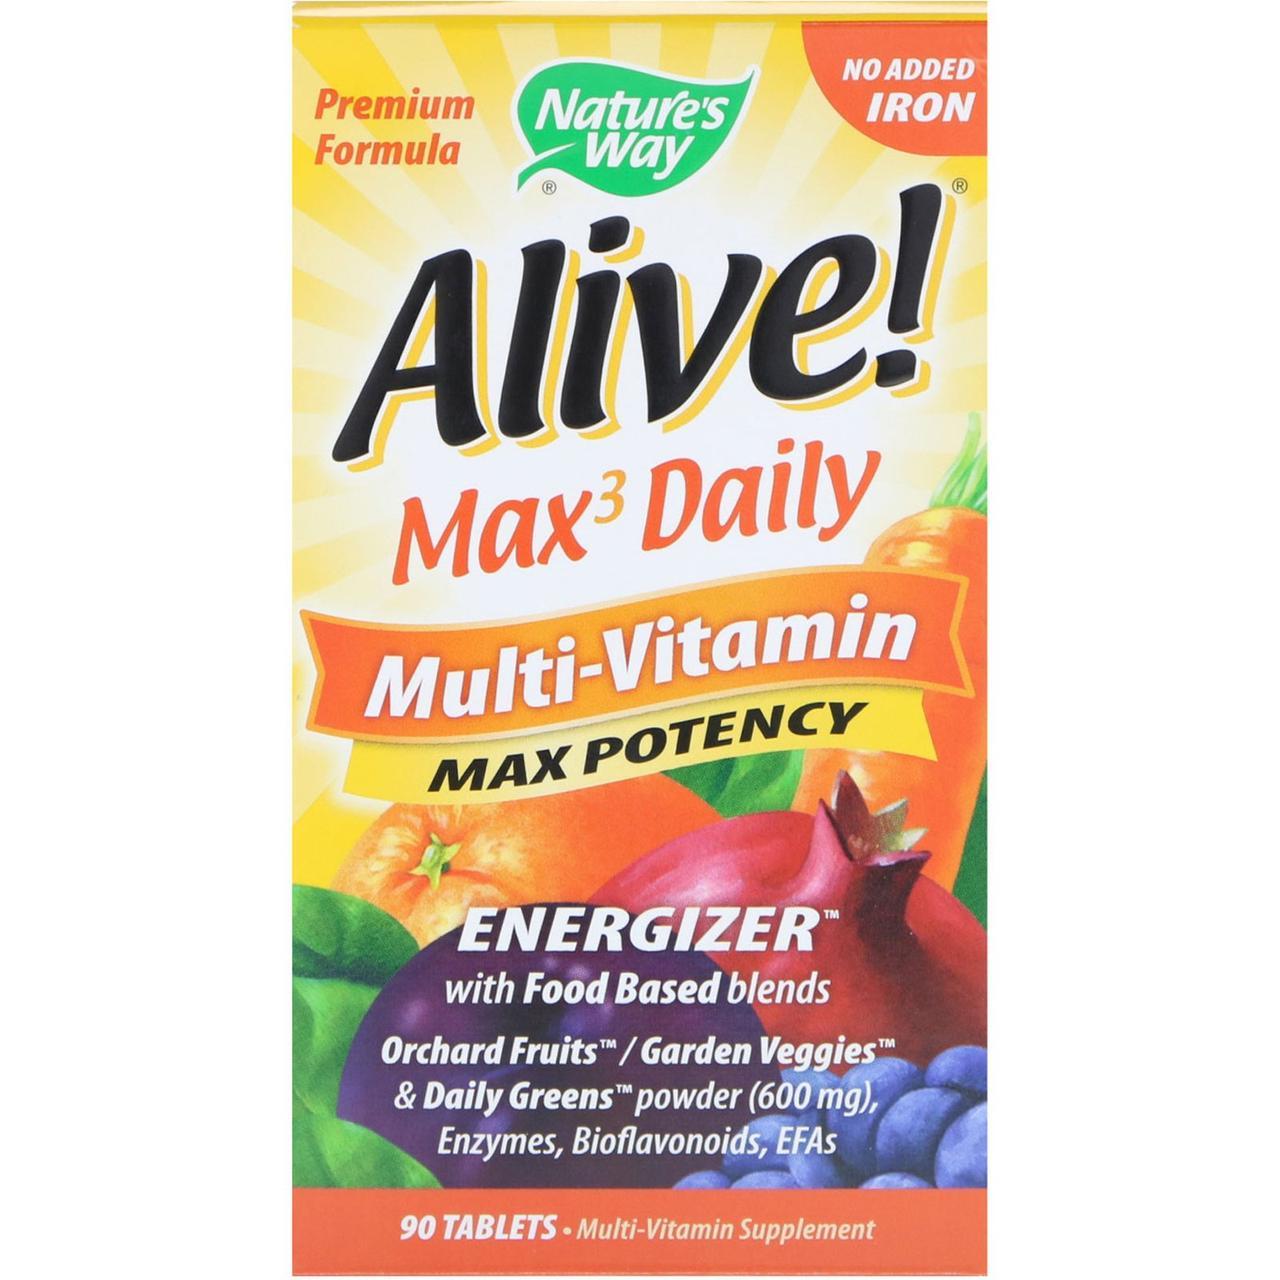 Комплекс виатминов Nature's Way, Alive! Max3 Daily, без железа, 90 табл.